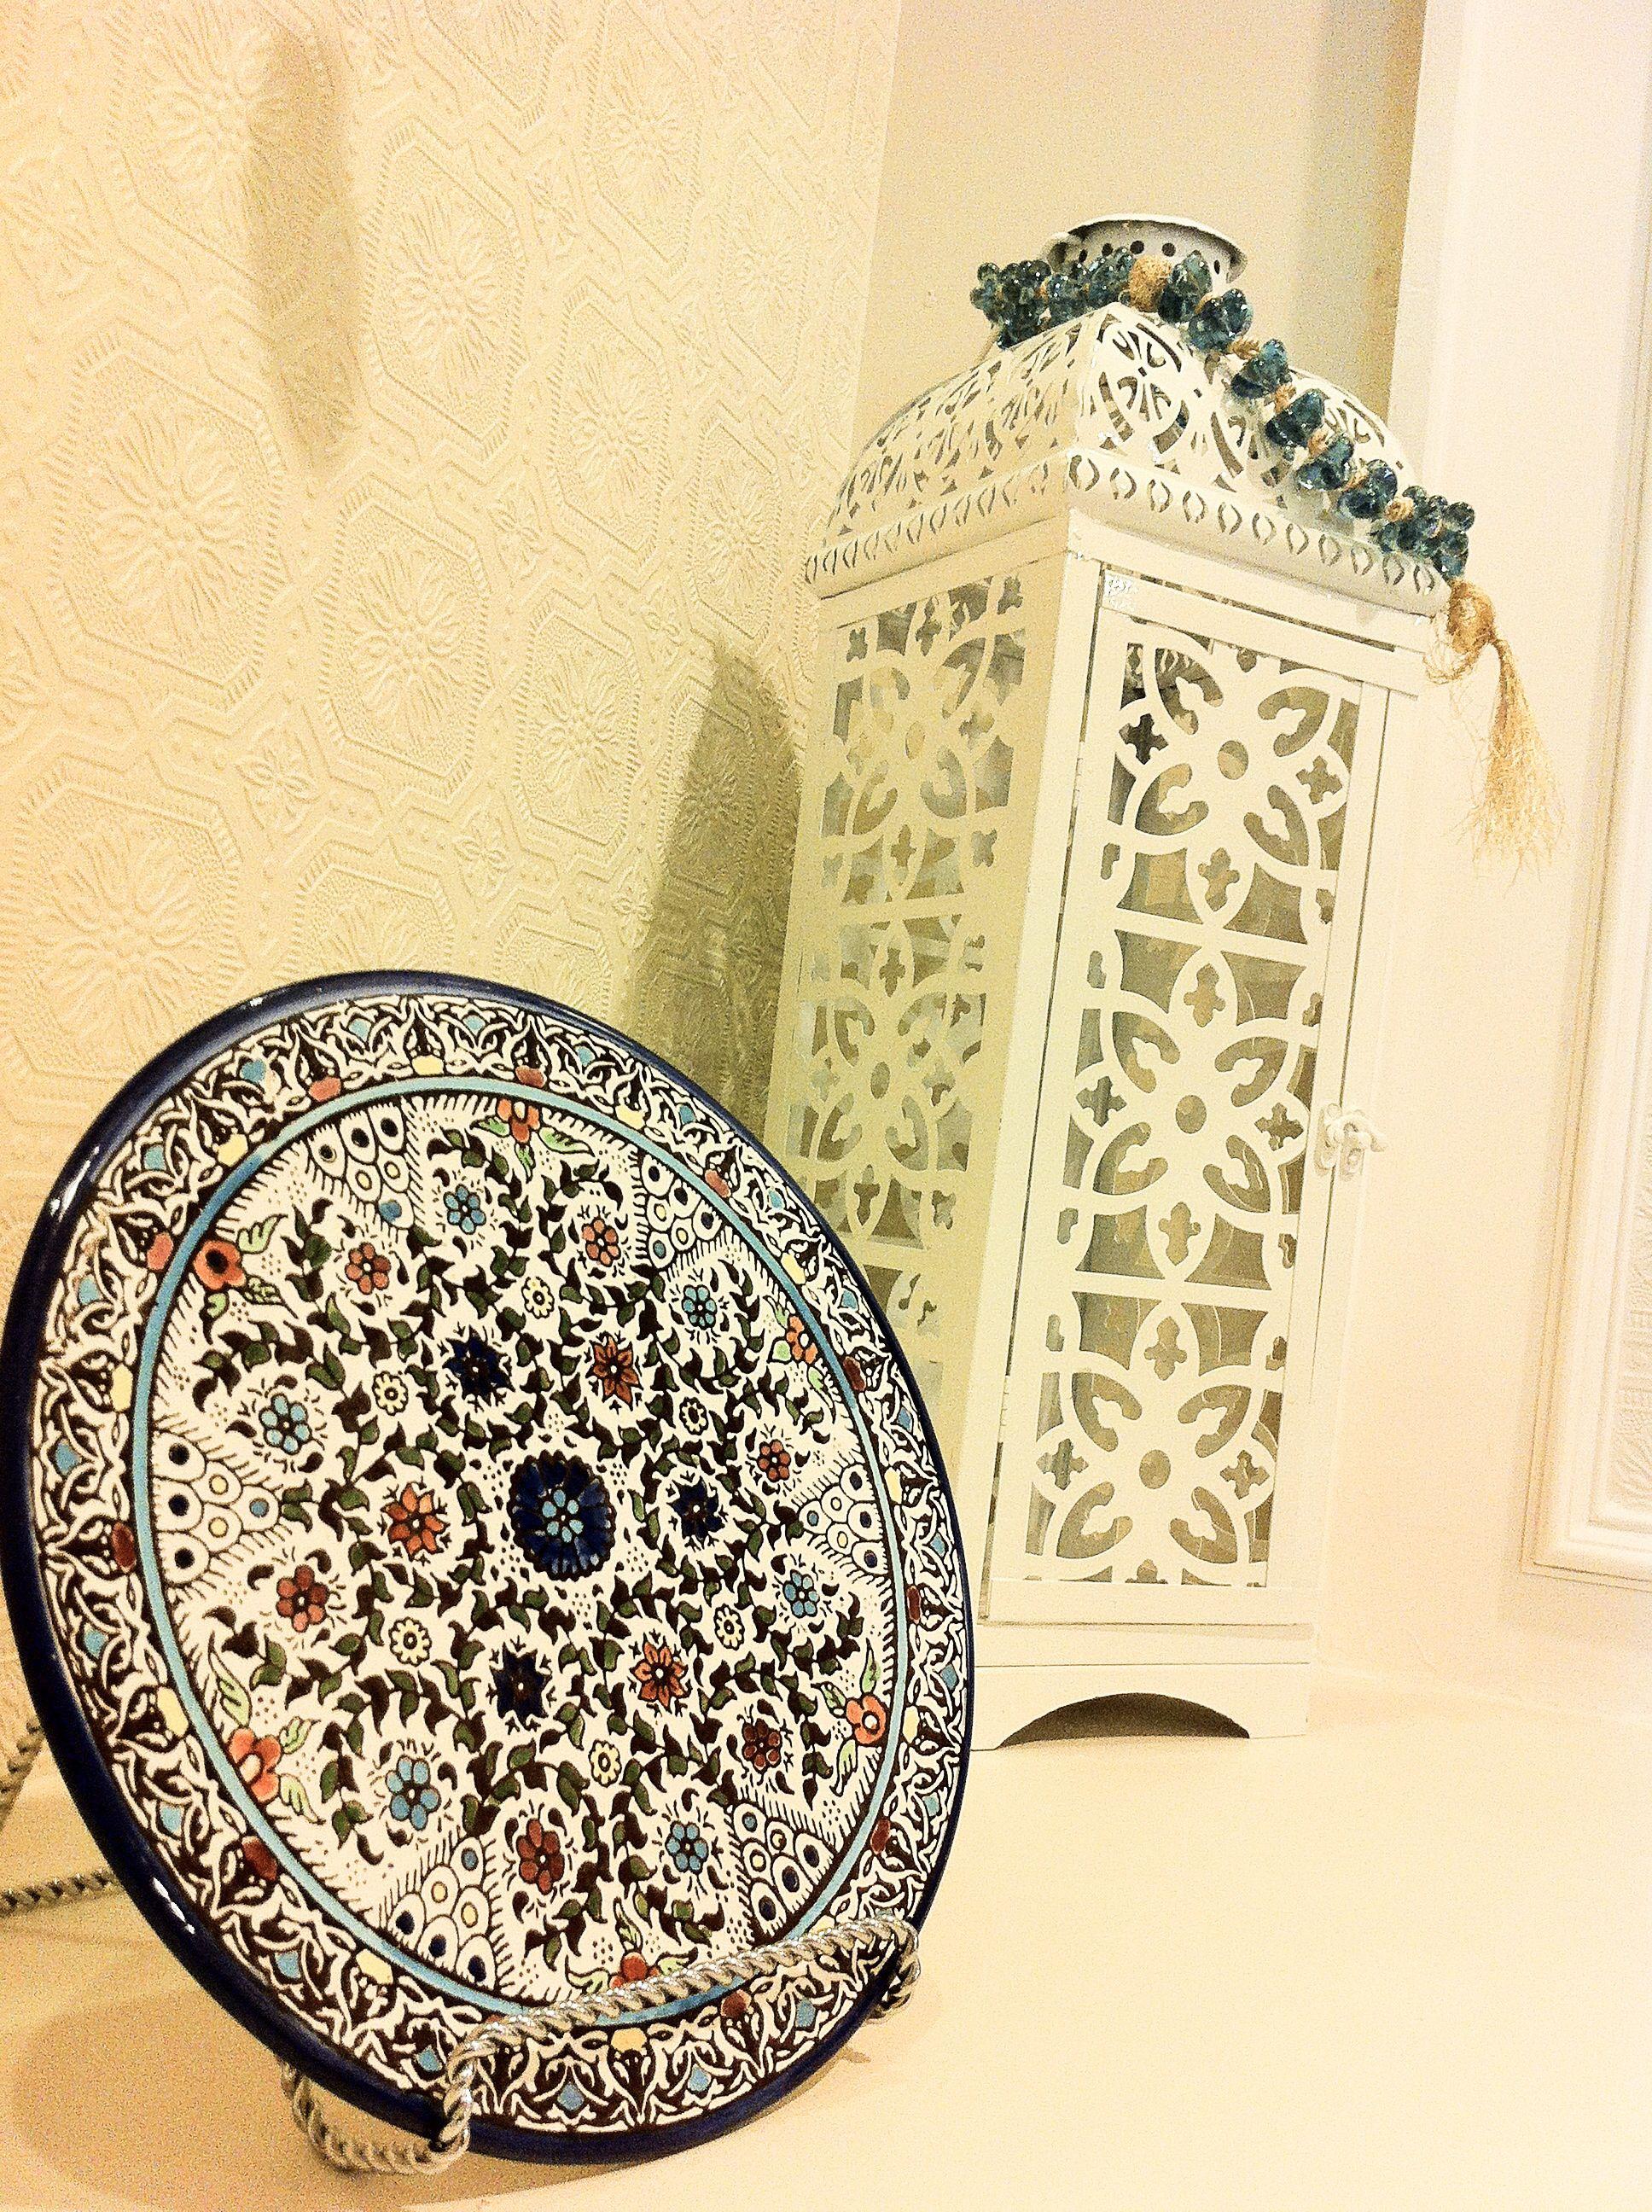 Hobby lobby glass ornaments - Ramadan Decor White Metal Lantern Hobby Lobby Mediterranean Hand Painted Plate From Jordan Glass Prayer Beads